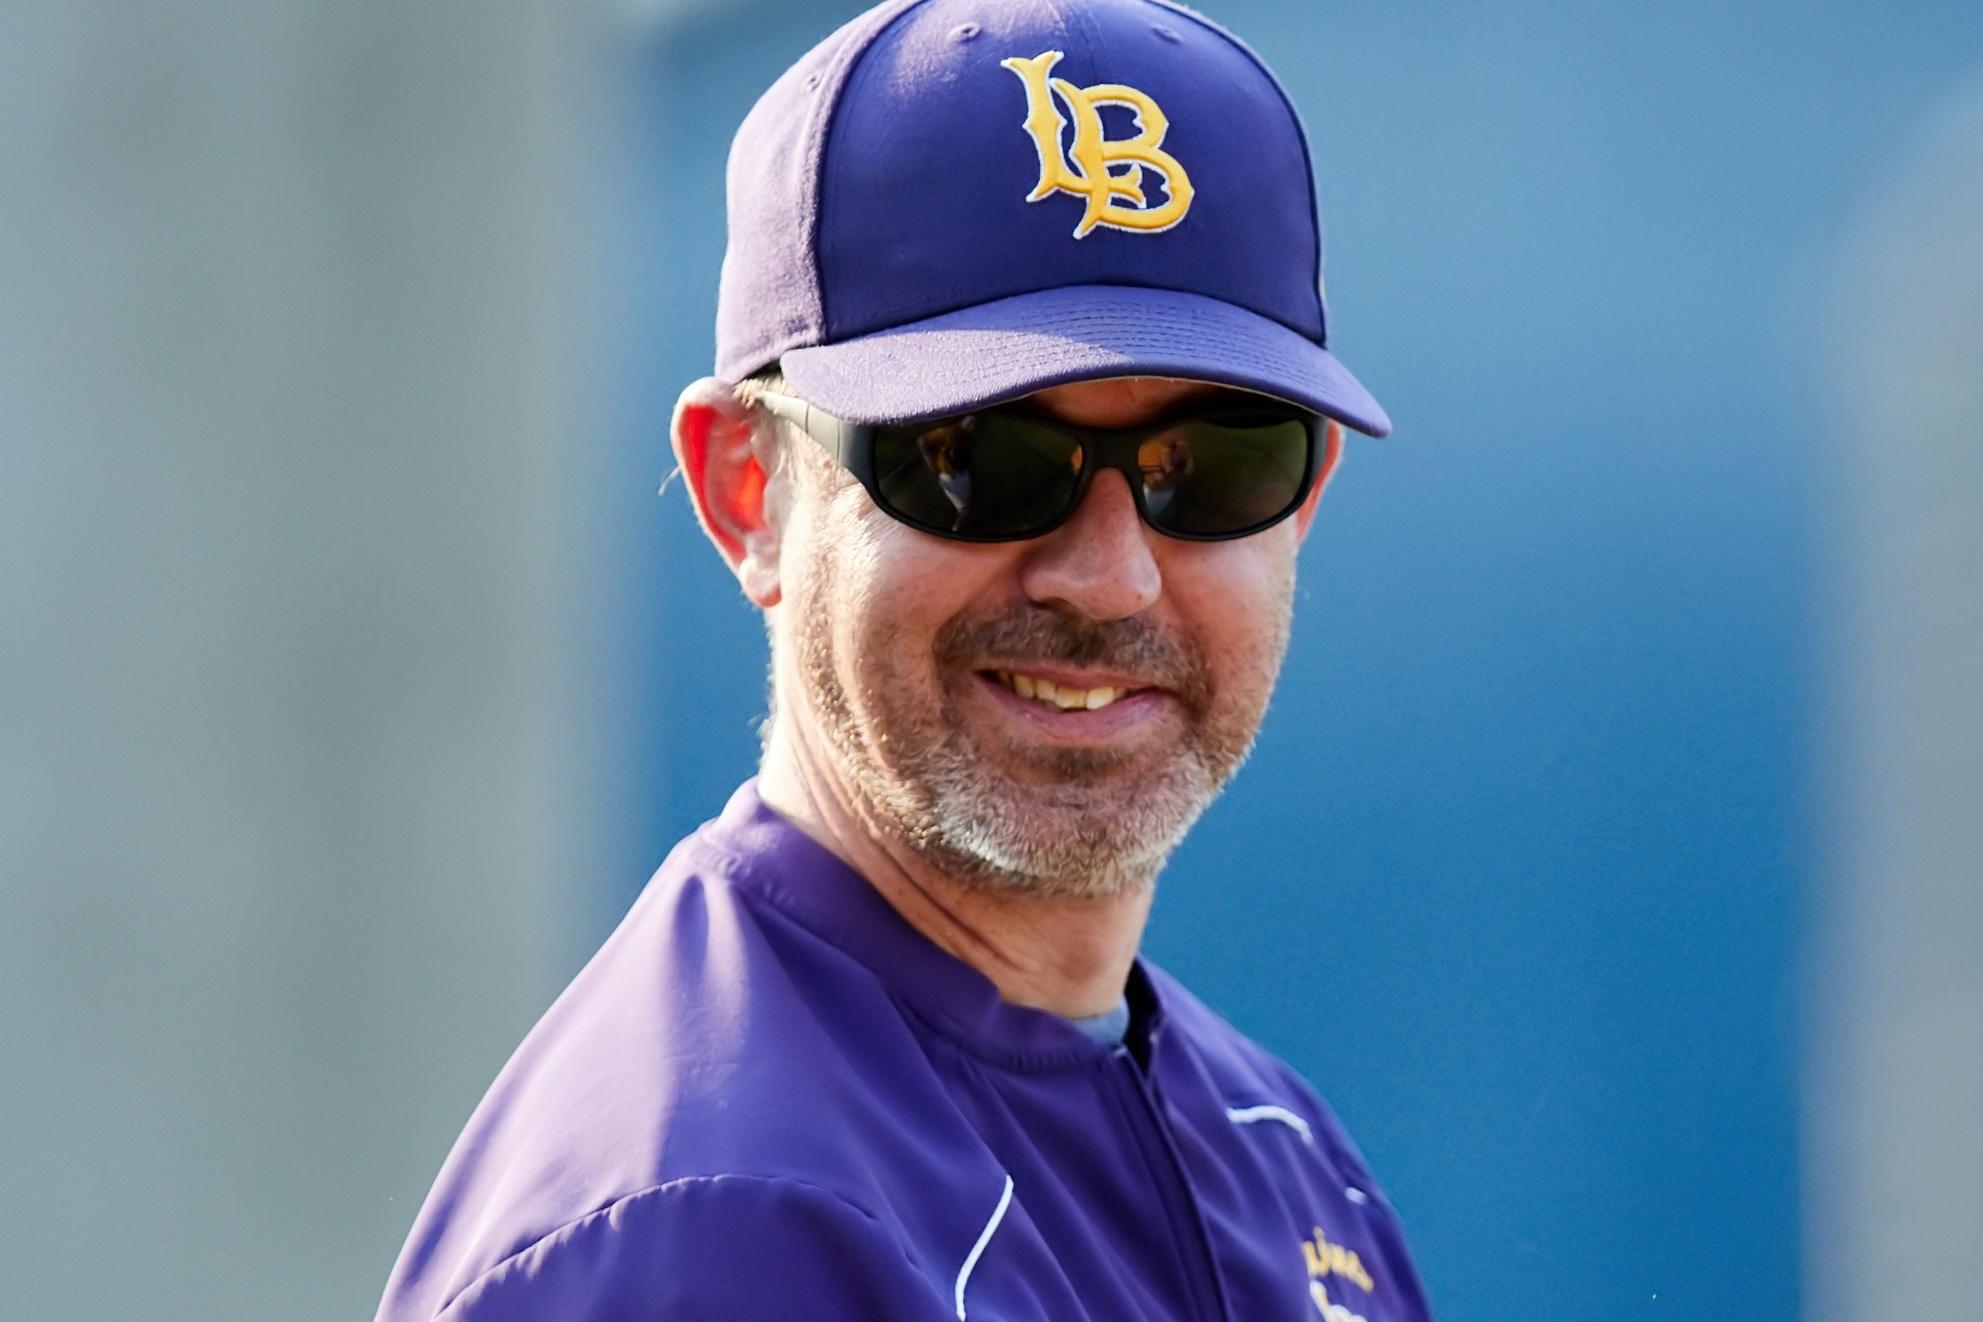 Coach of the Year - John Thomas - Lake Braddock